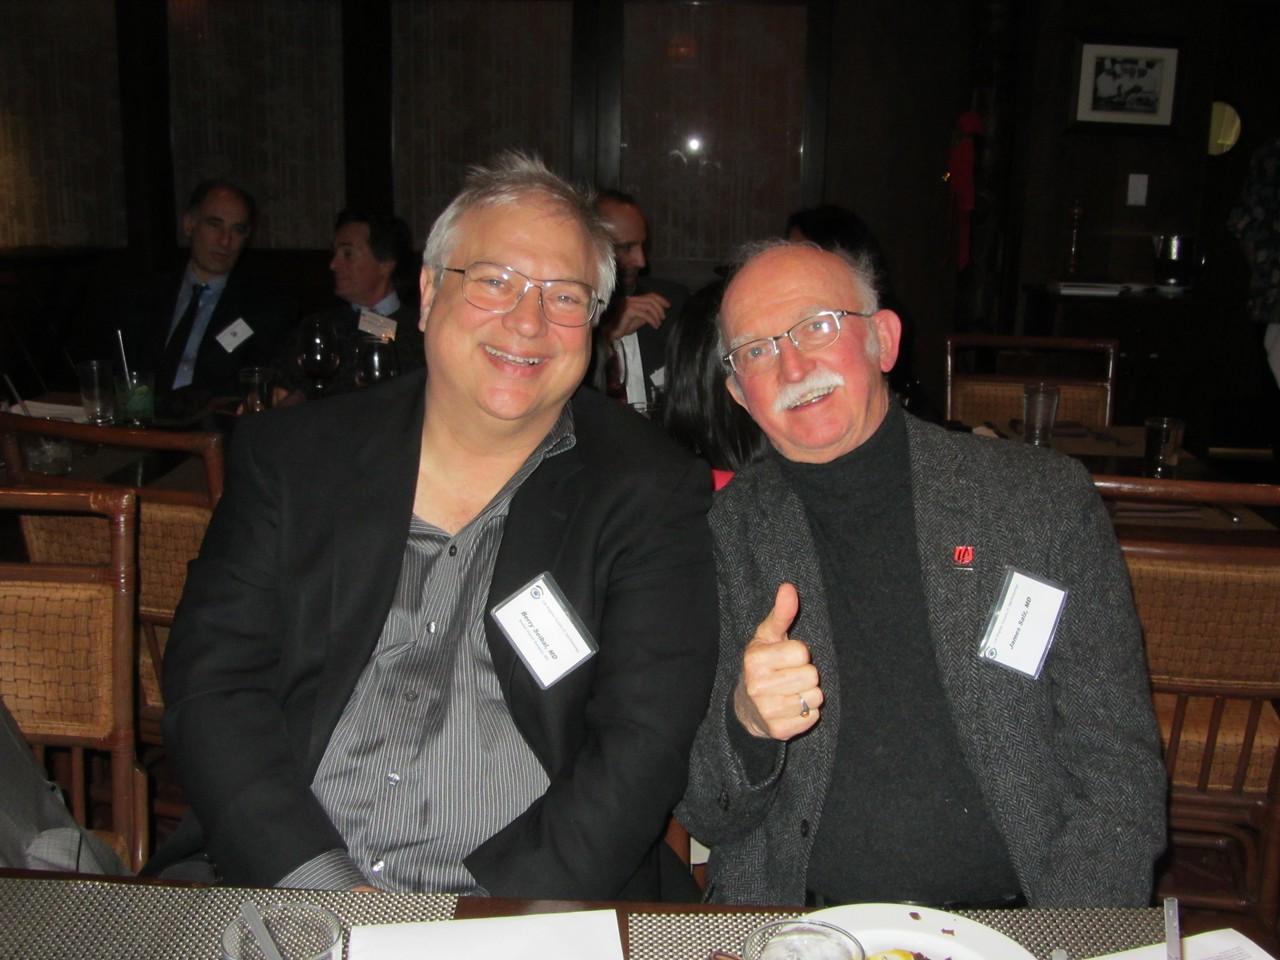 Barry Seibel & Jim Salz